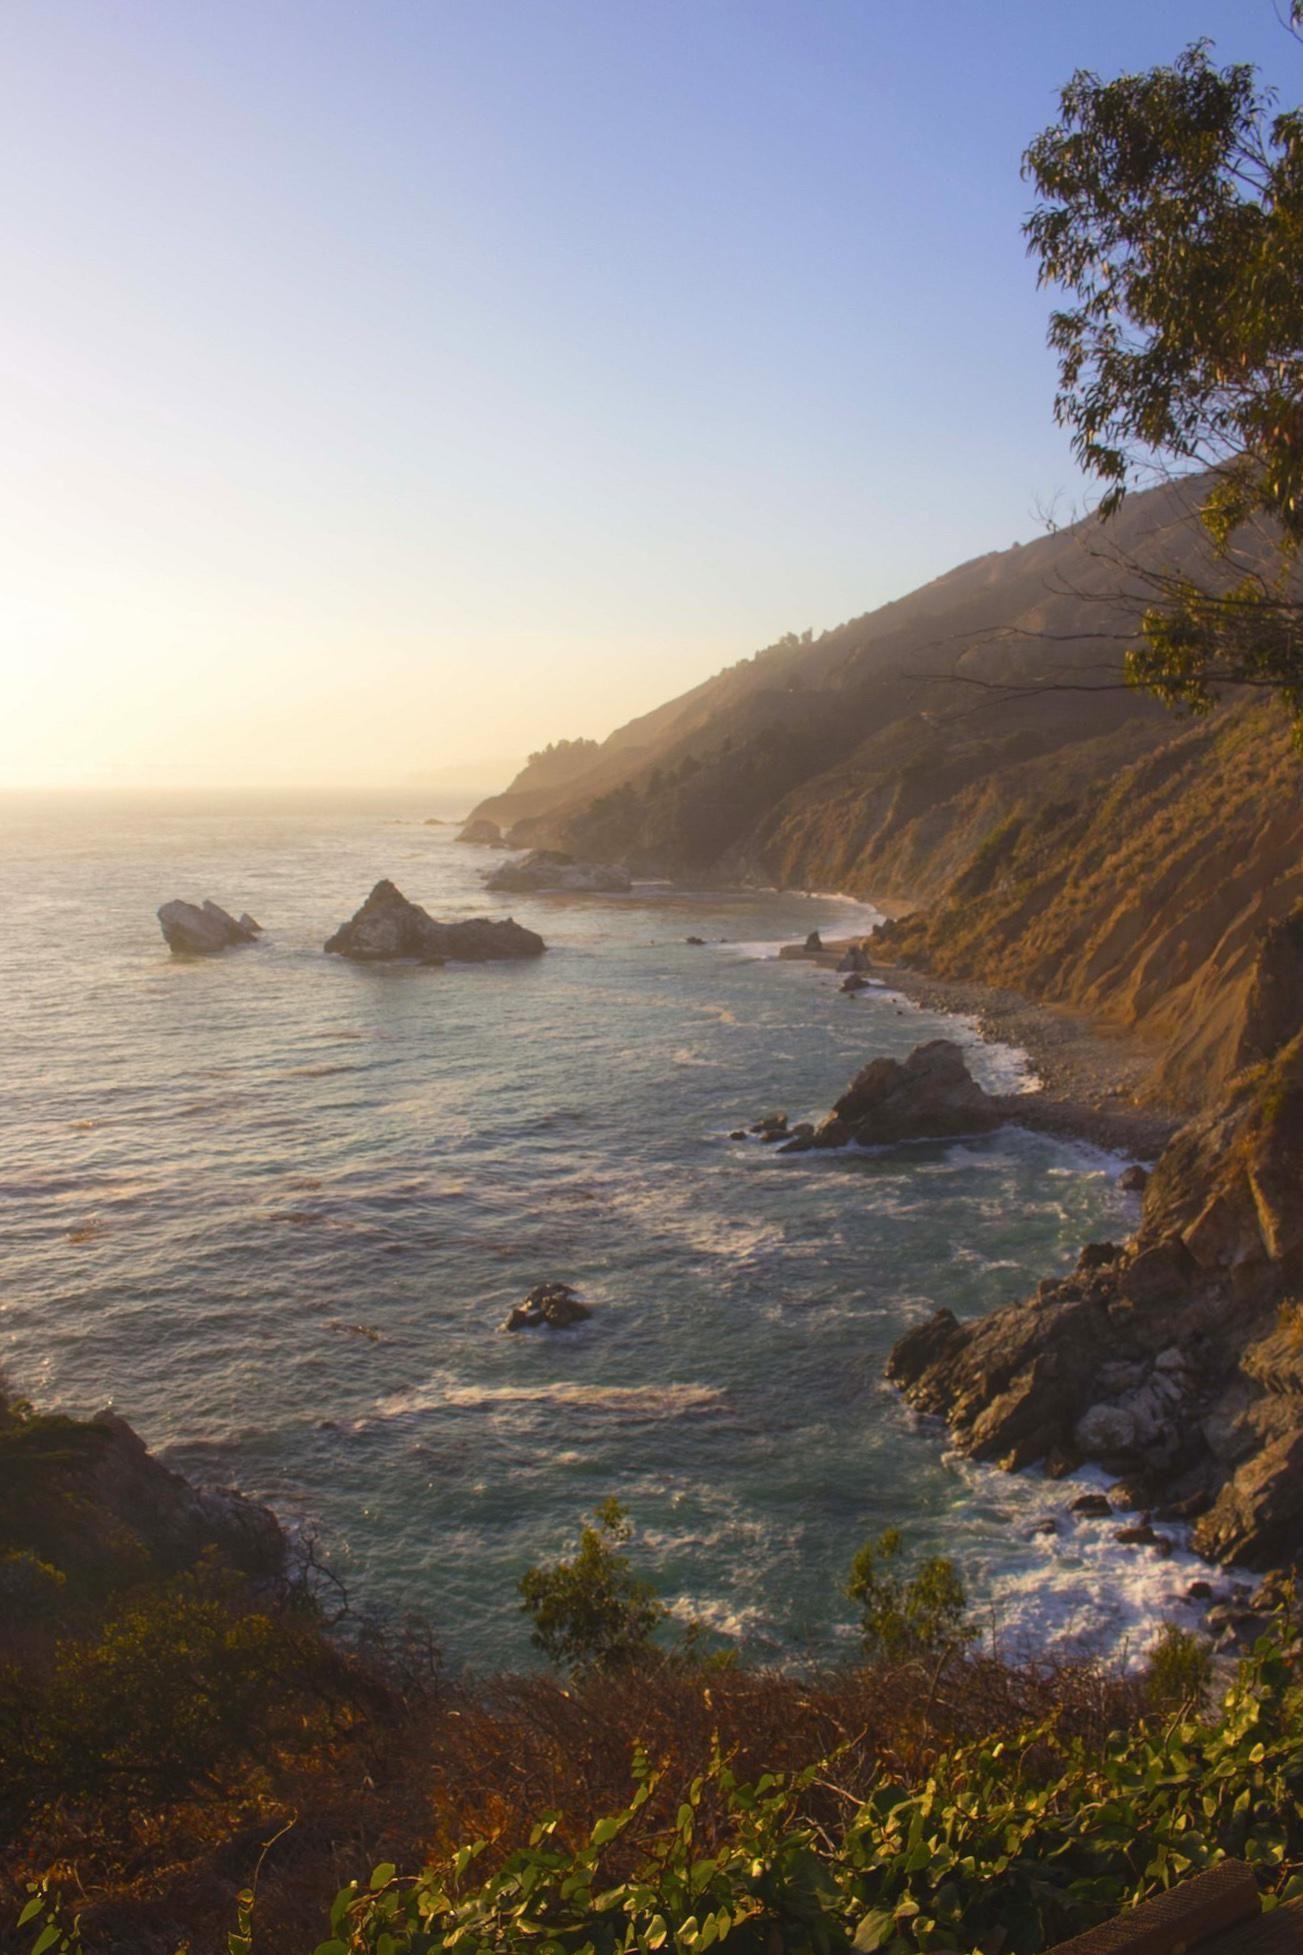 Sunset Over At Big Sur California 4000x6000 Oc Big Sur Big Sur California Natural Scenery